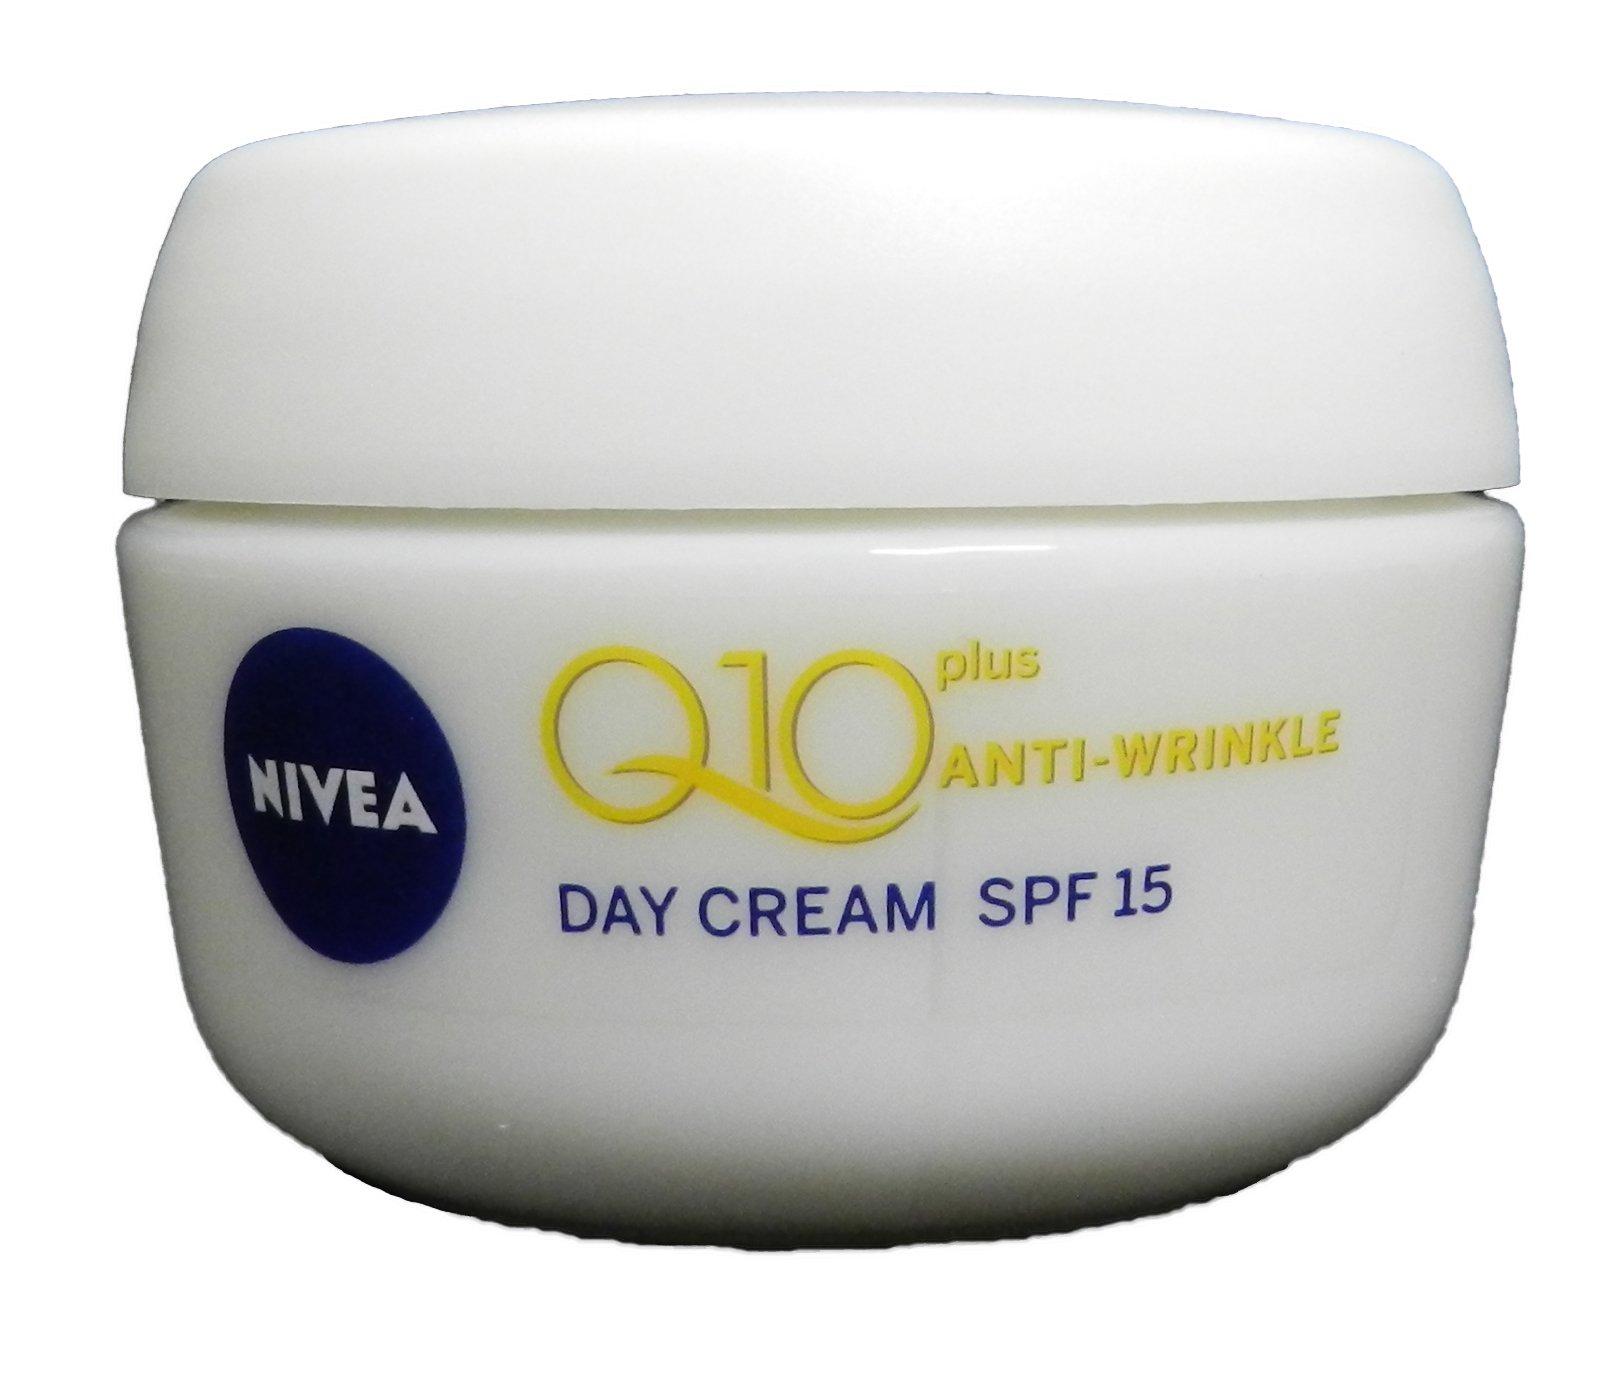 Nivea Visage Q10 Plus Creatine Anti Wrinkle Day Cream 1.7oz. / 50ml NEW IMPROVED FORMULA